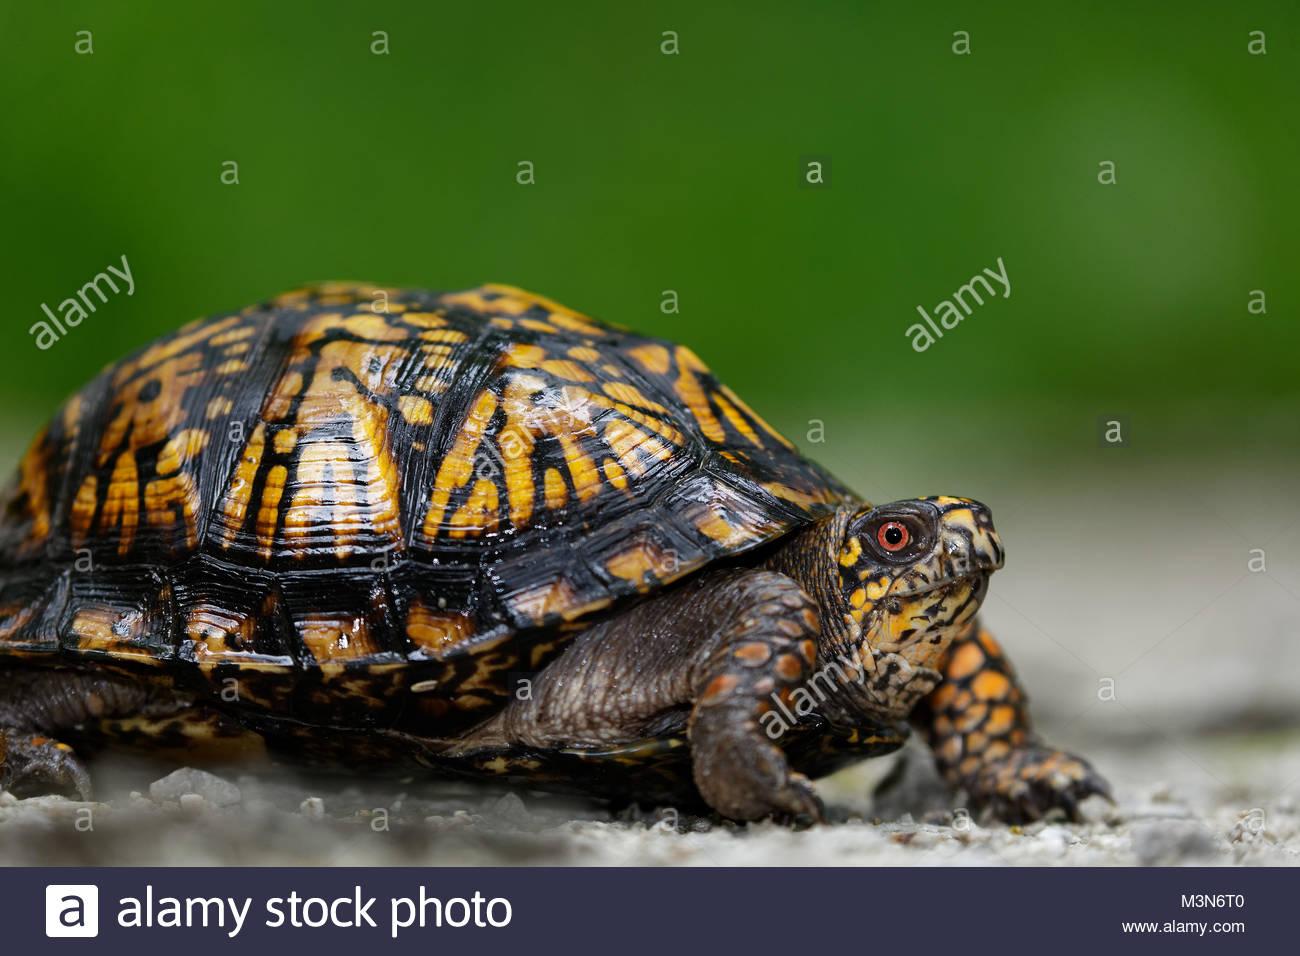 Eastern Box Turtle (Terrapene carolina) - Stock Image